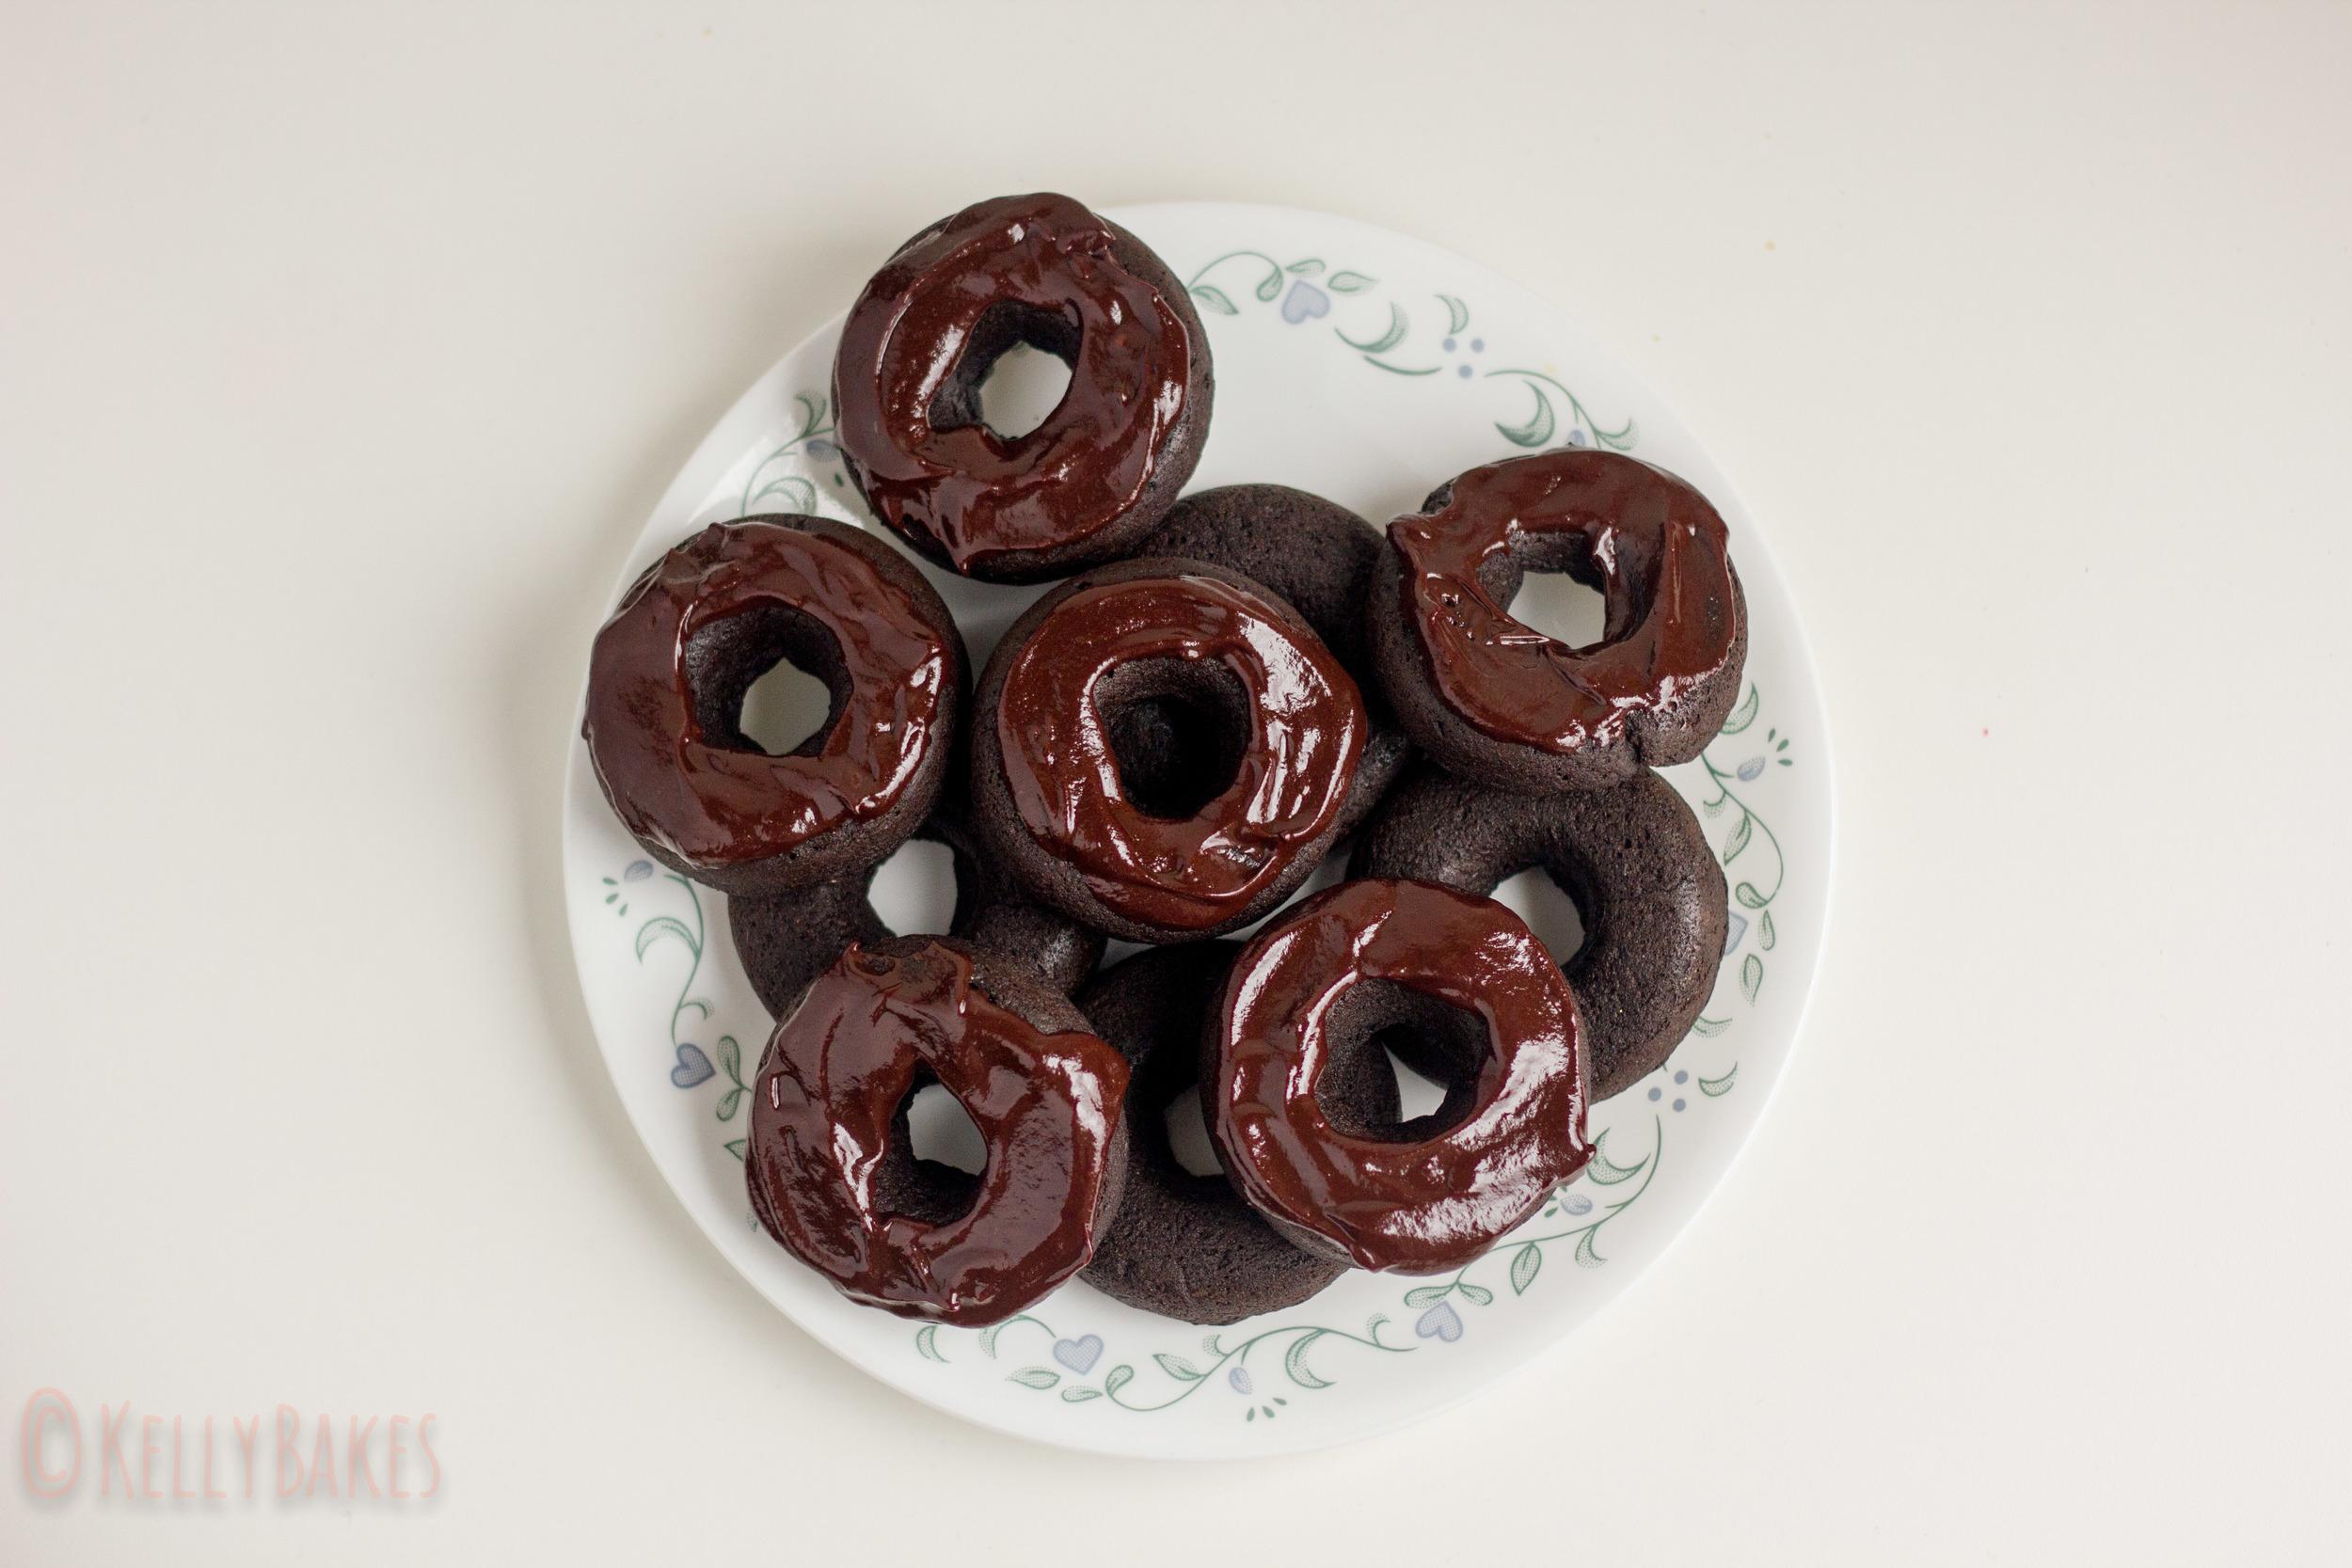 vegan gf coconut chocolate donuts-3.jpg